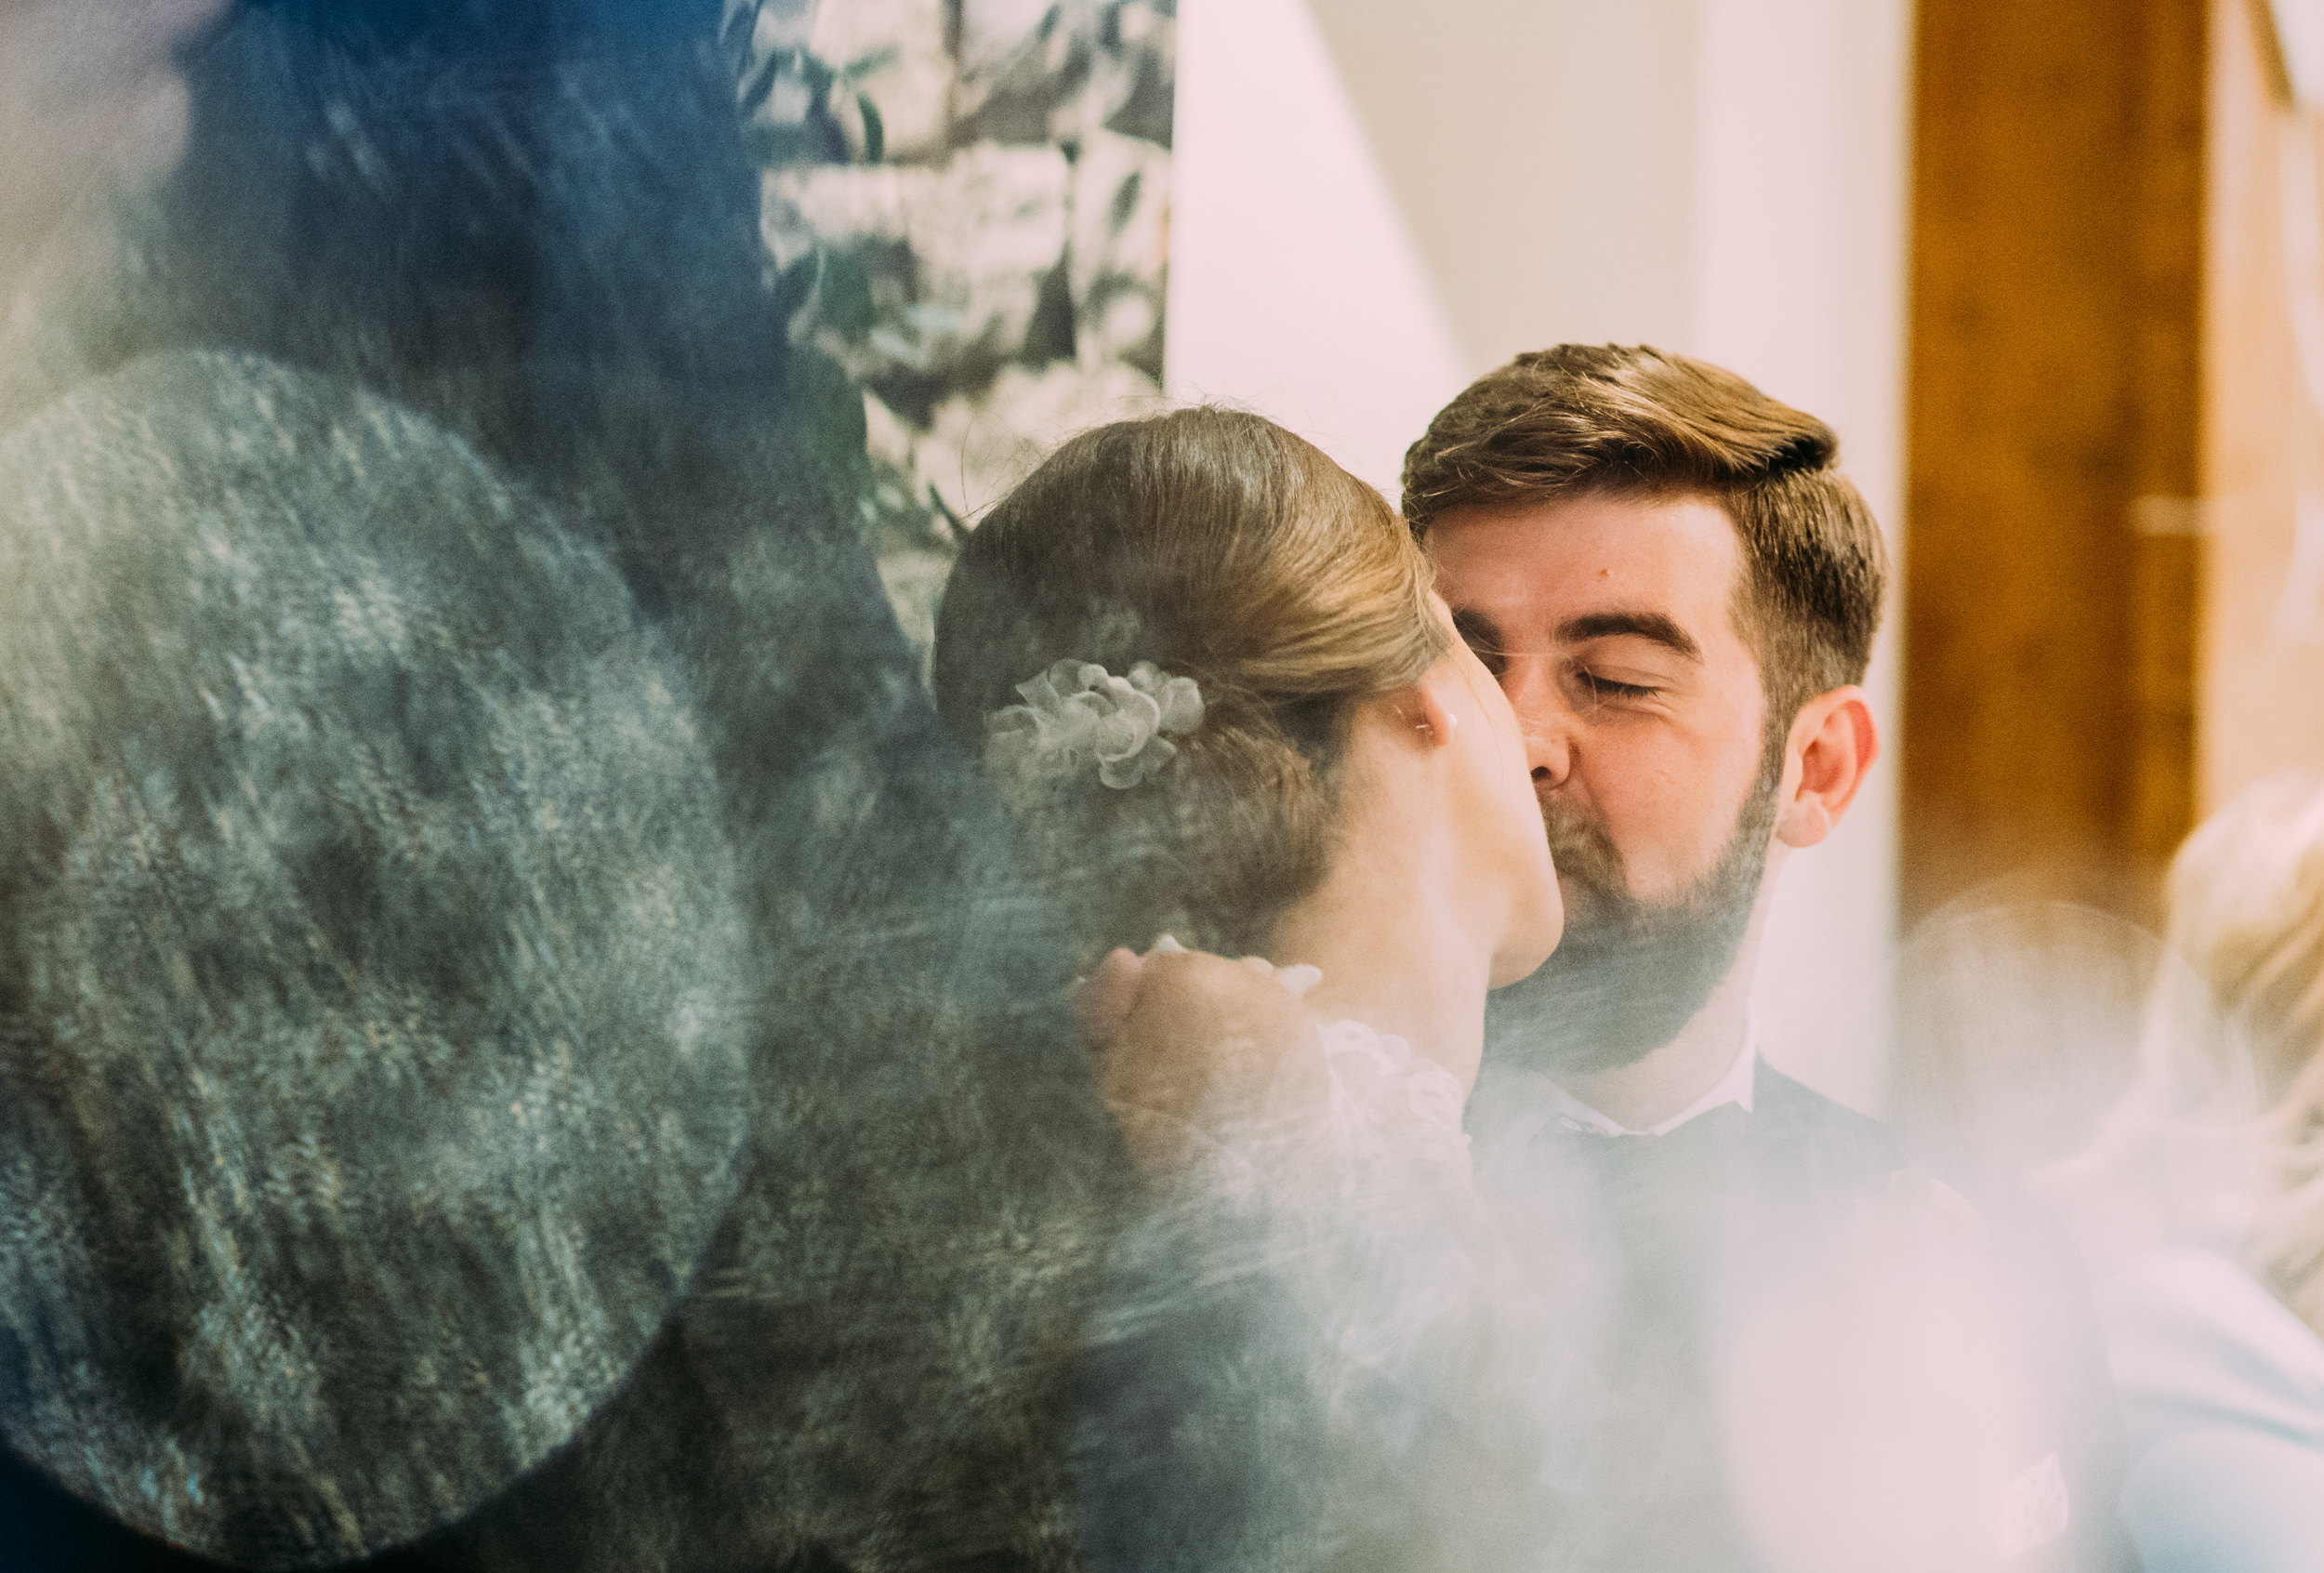 David Scholes Lancashire wedding photography 2016-180.jpg